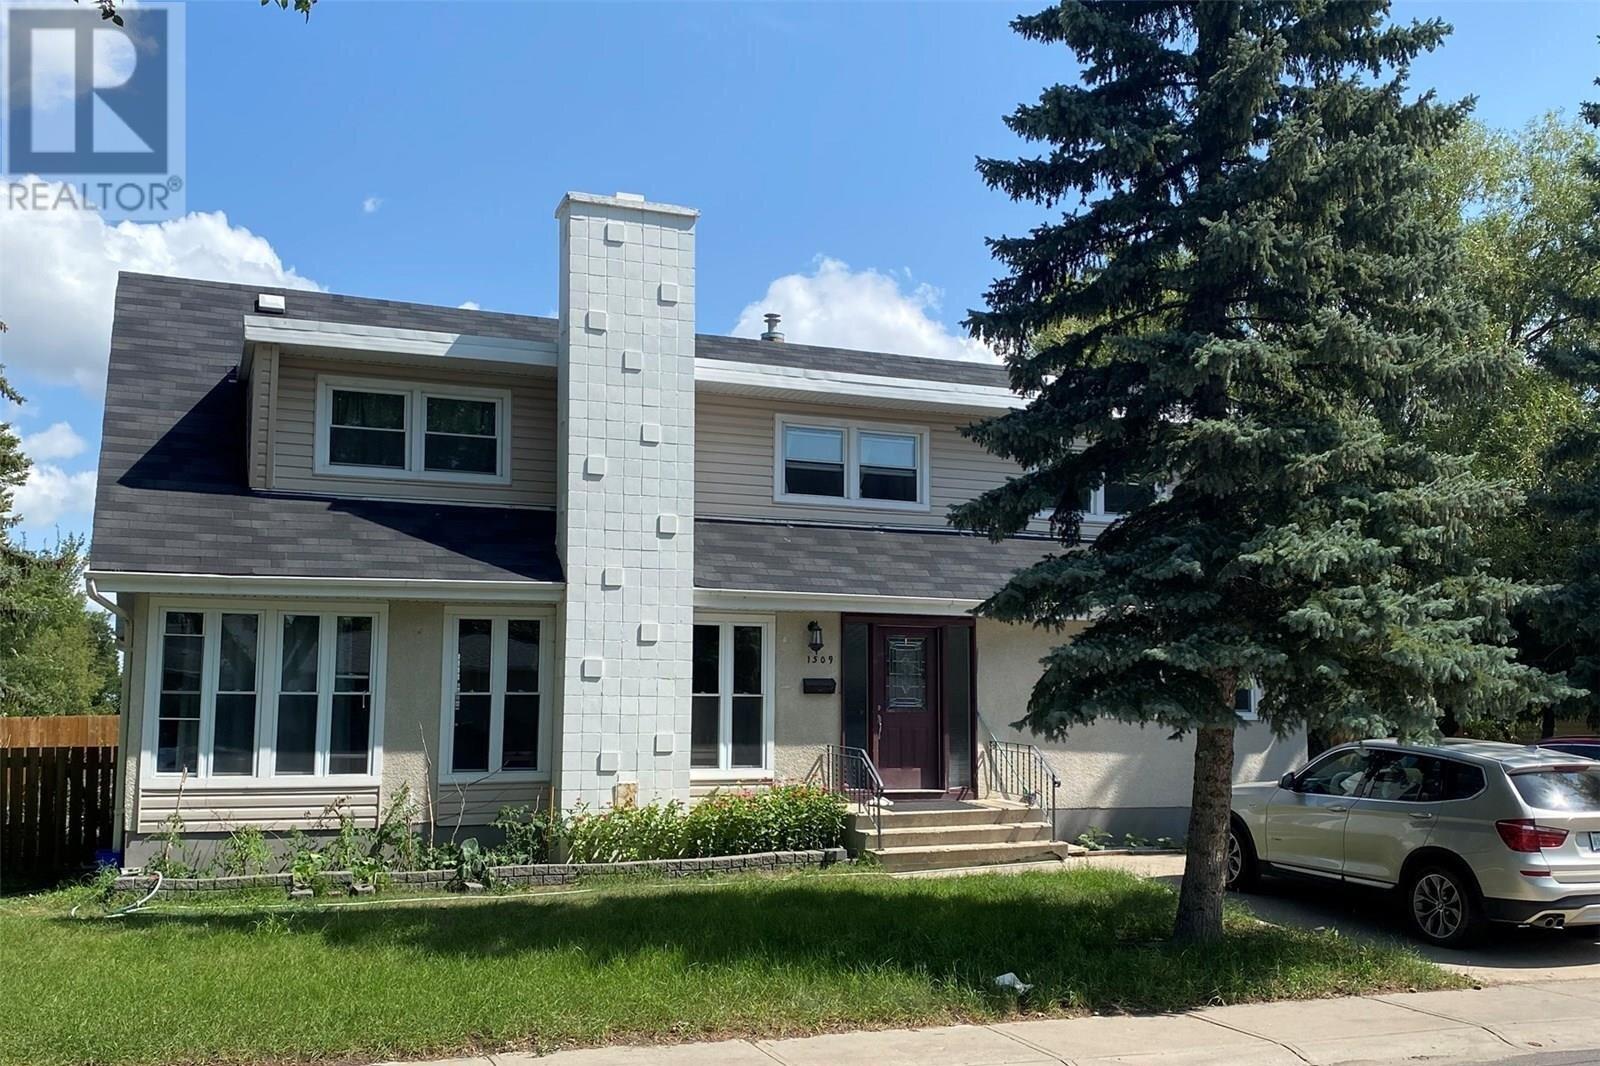 House for sale at 1509 Shannon Rd Regina Saskatchewan - MLS: SK819760